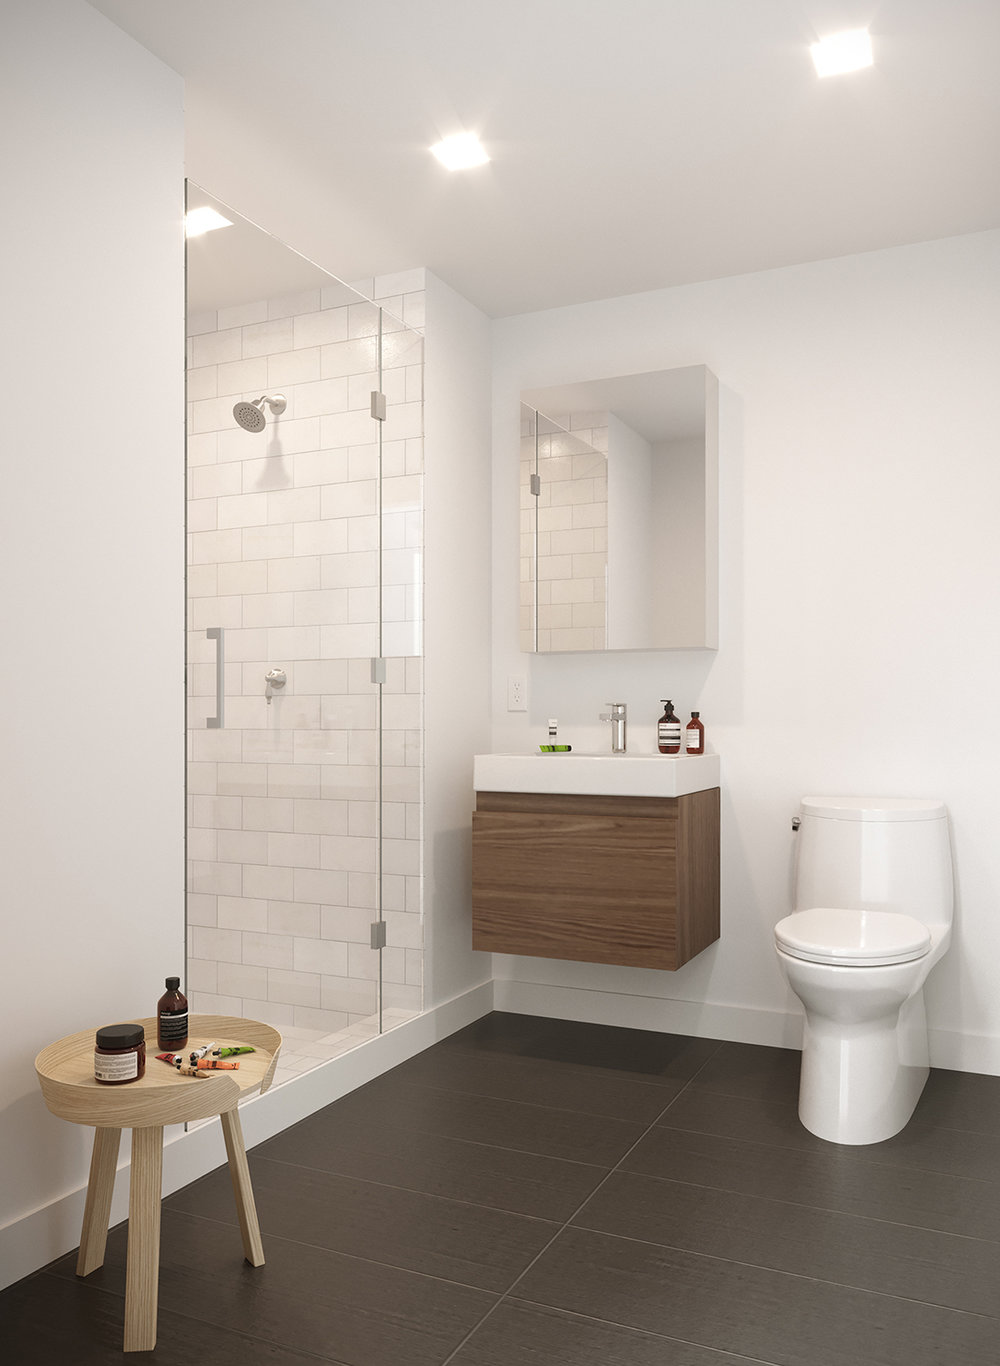 Verse H_Interior Rendering_03_Master Bathroom s_ver 2.jpg